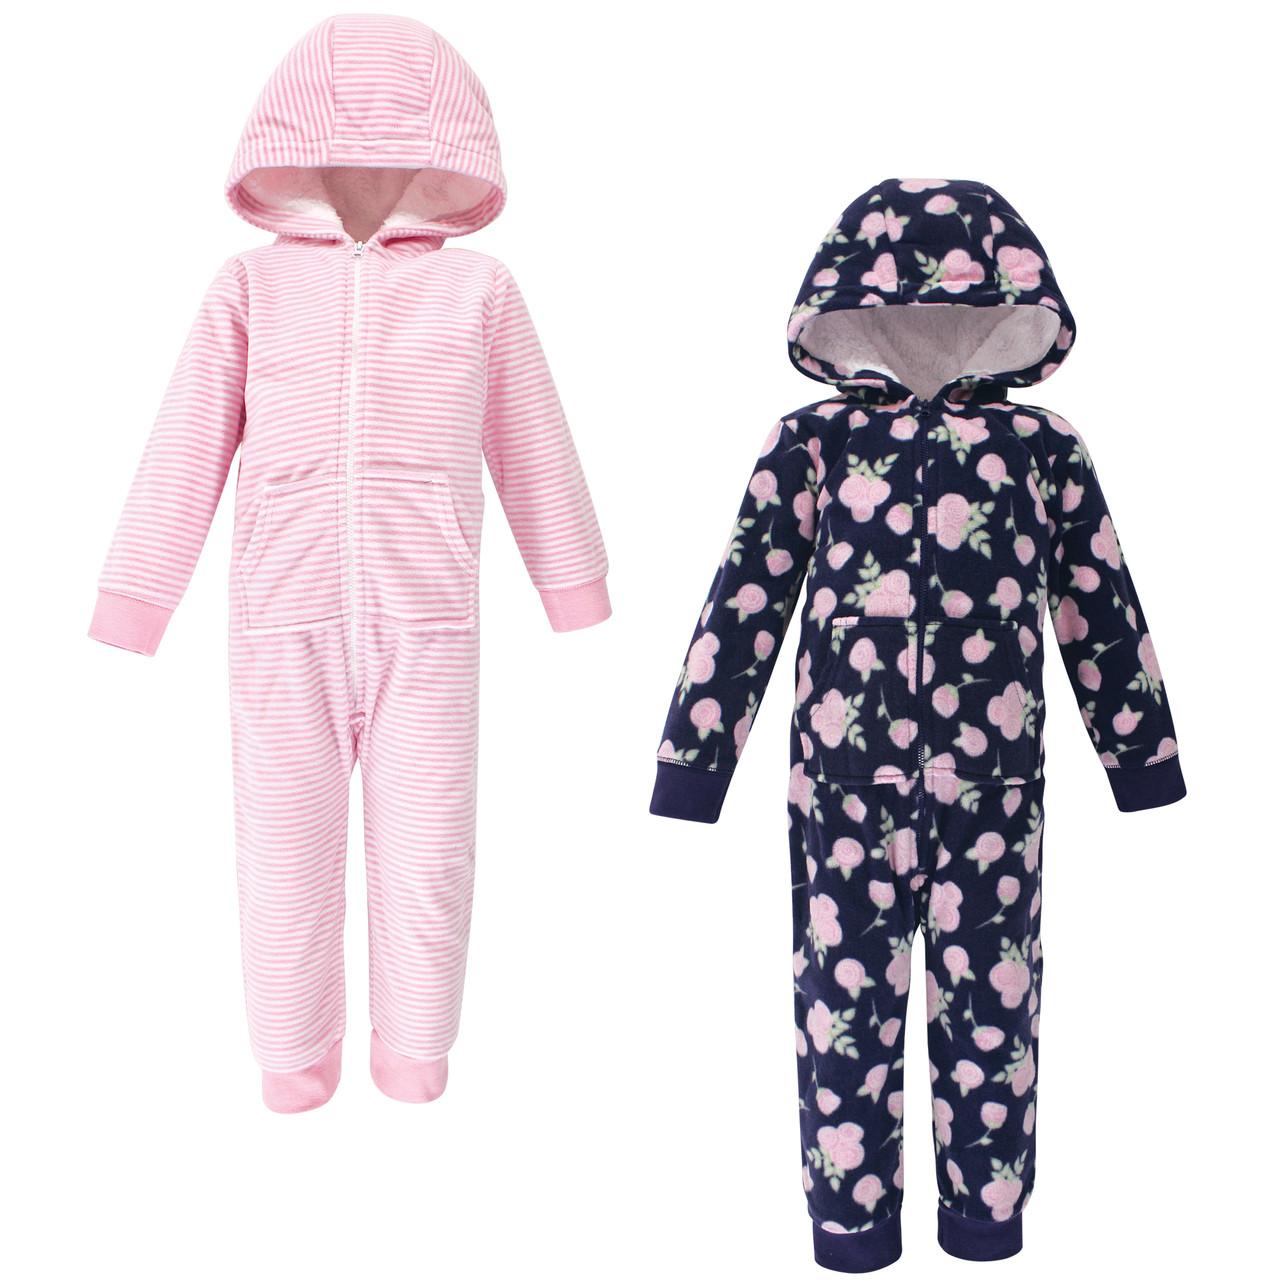 Navy Rose Hudson Baby Girl Toddler Fleece Jumpsuits 2pk